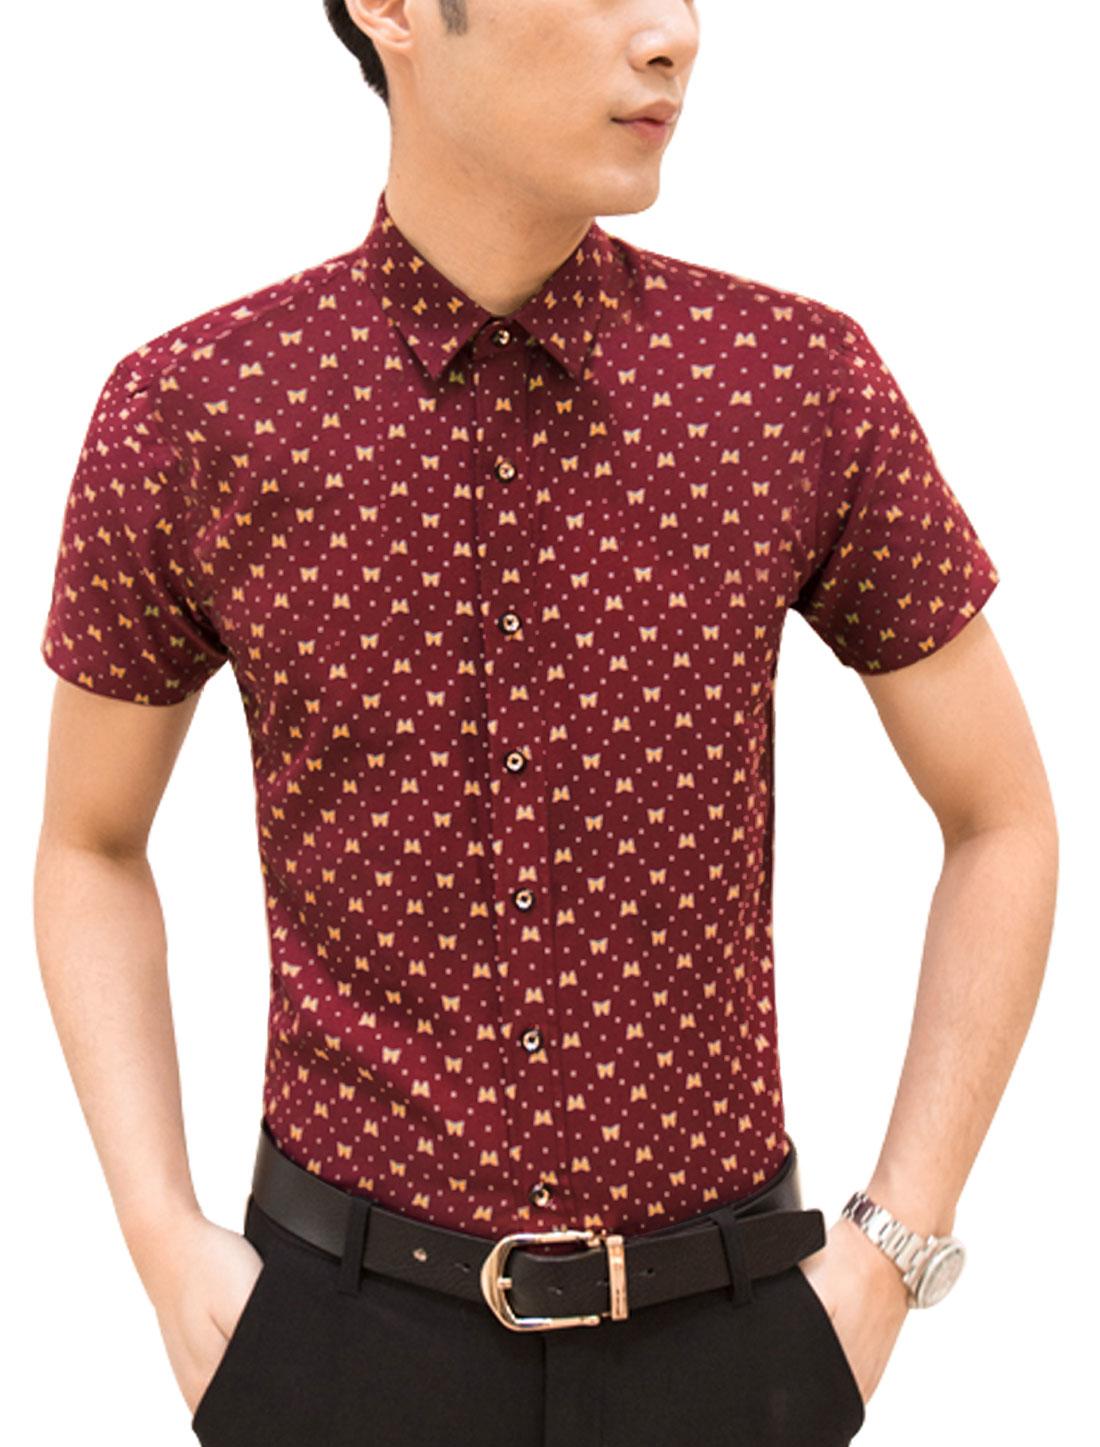 Men Short Sleeve Point Collar Dots Print Button Down Casual Shirt Burgundy M